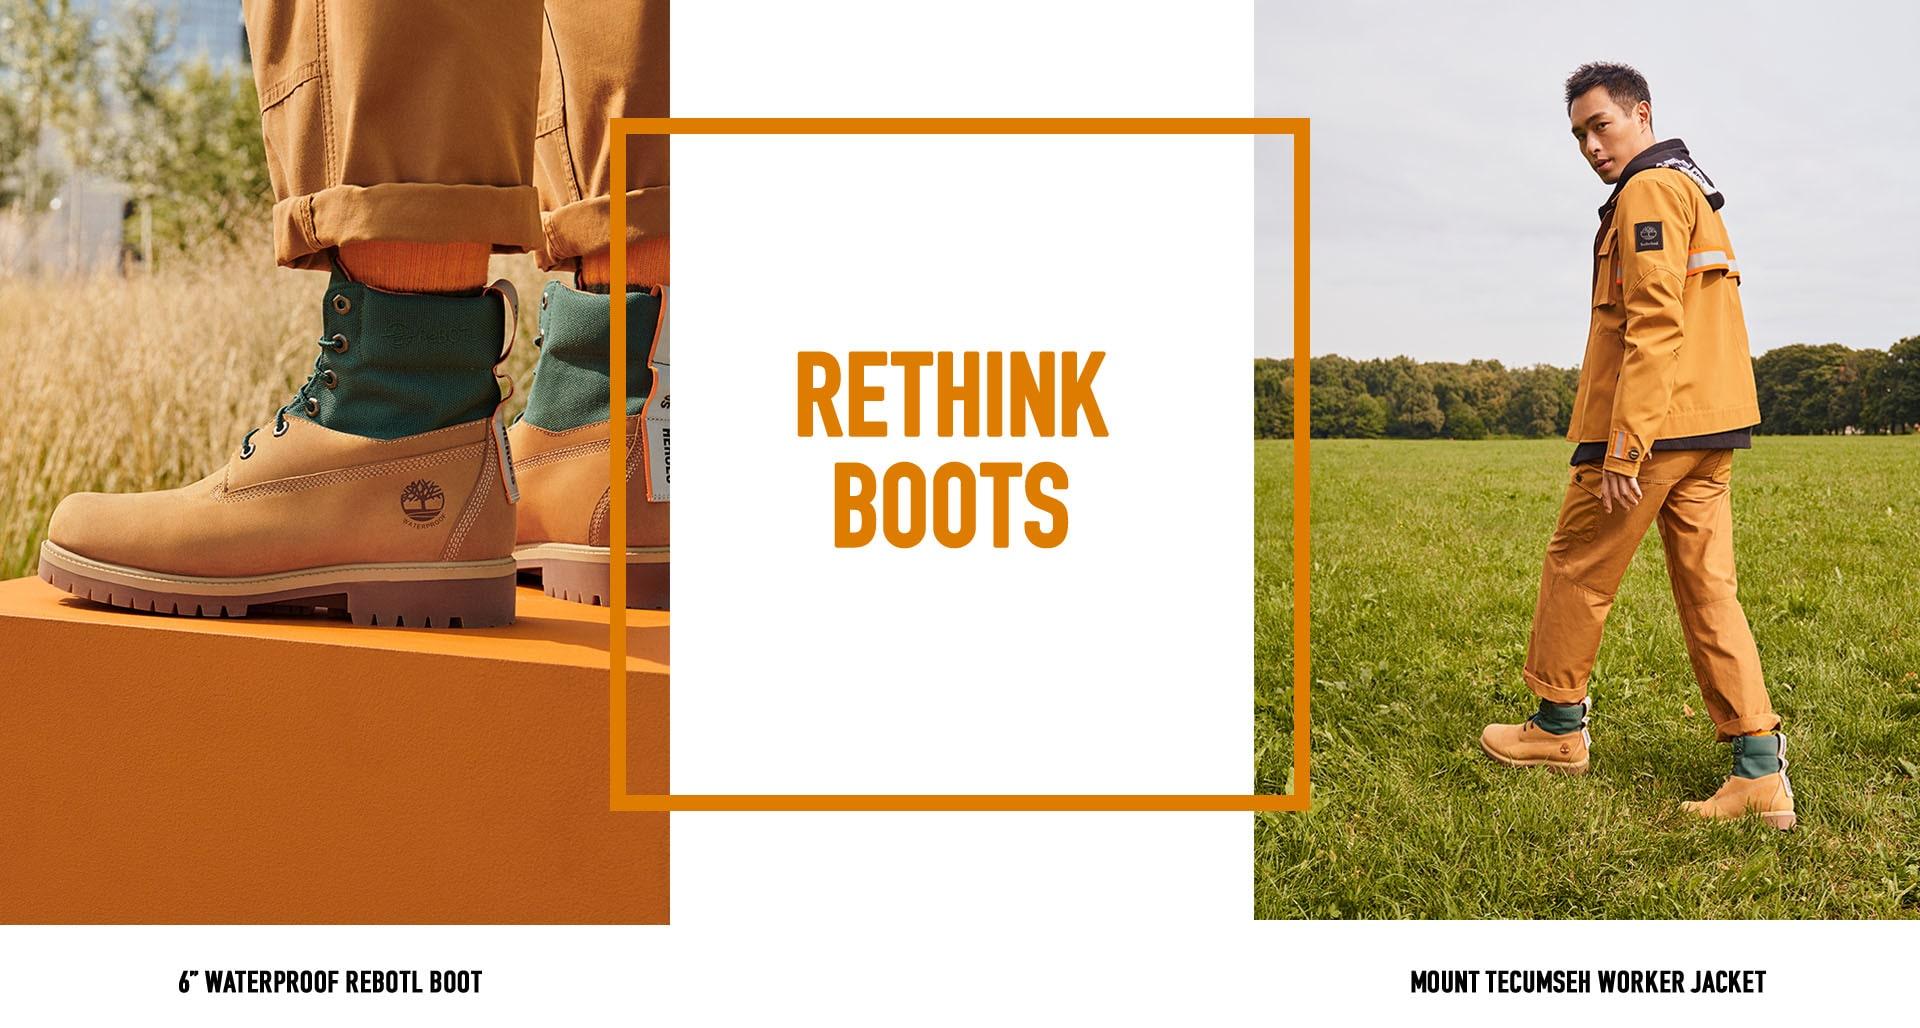 Rethink Boots